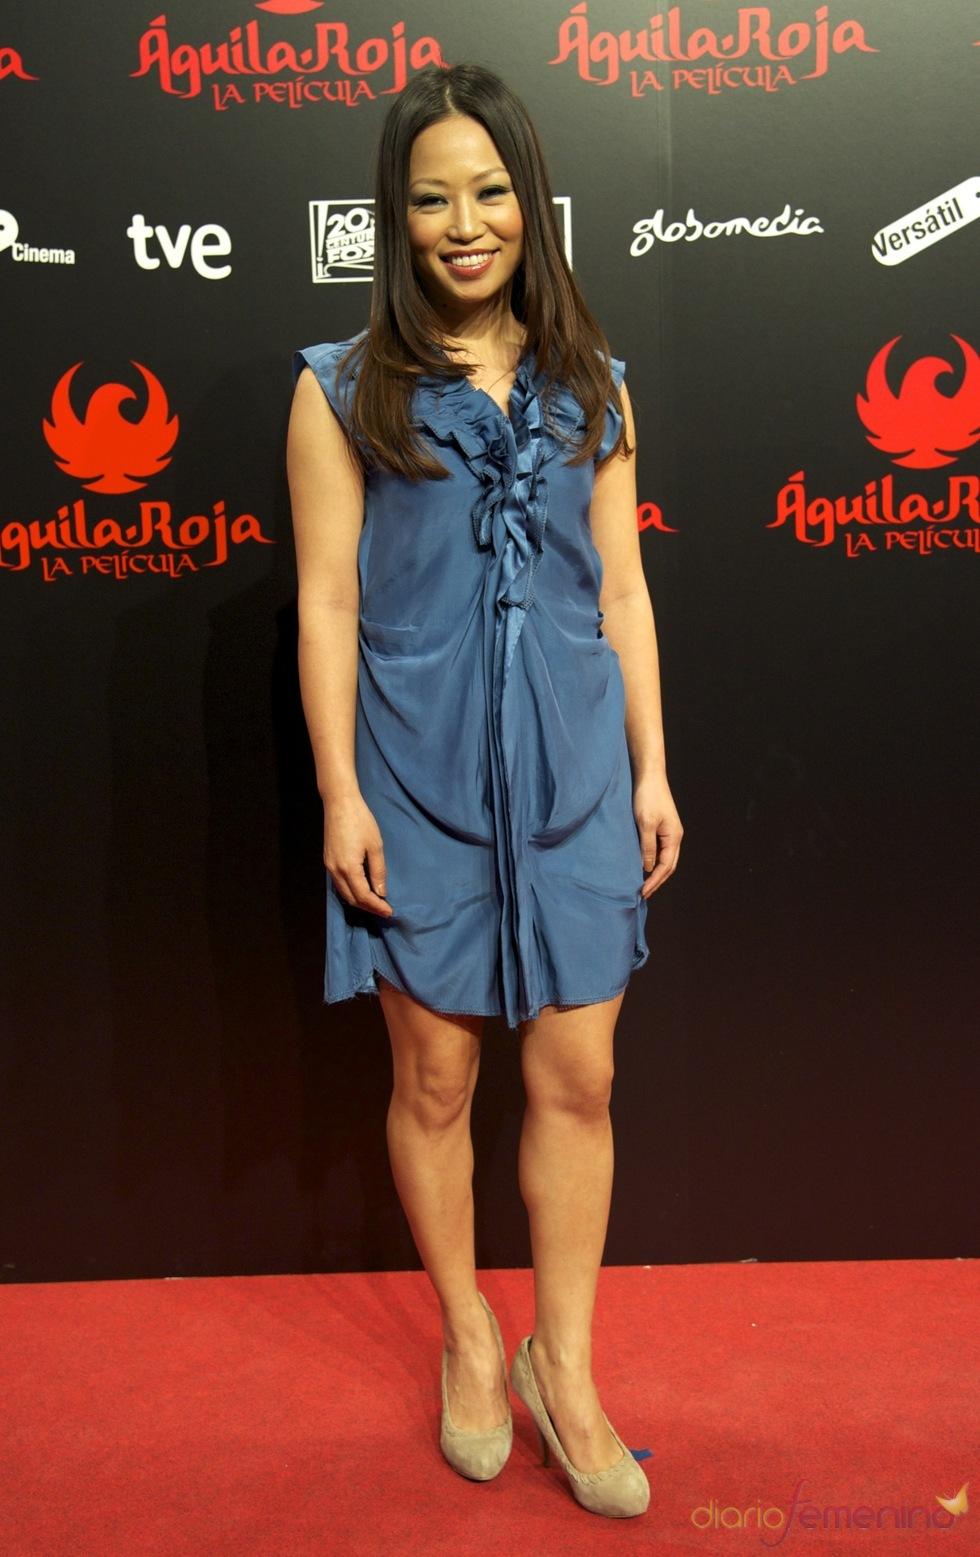 Usun Yoon en la premiere de 'Águila Roja' de Madrid